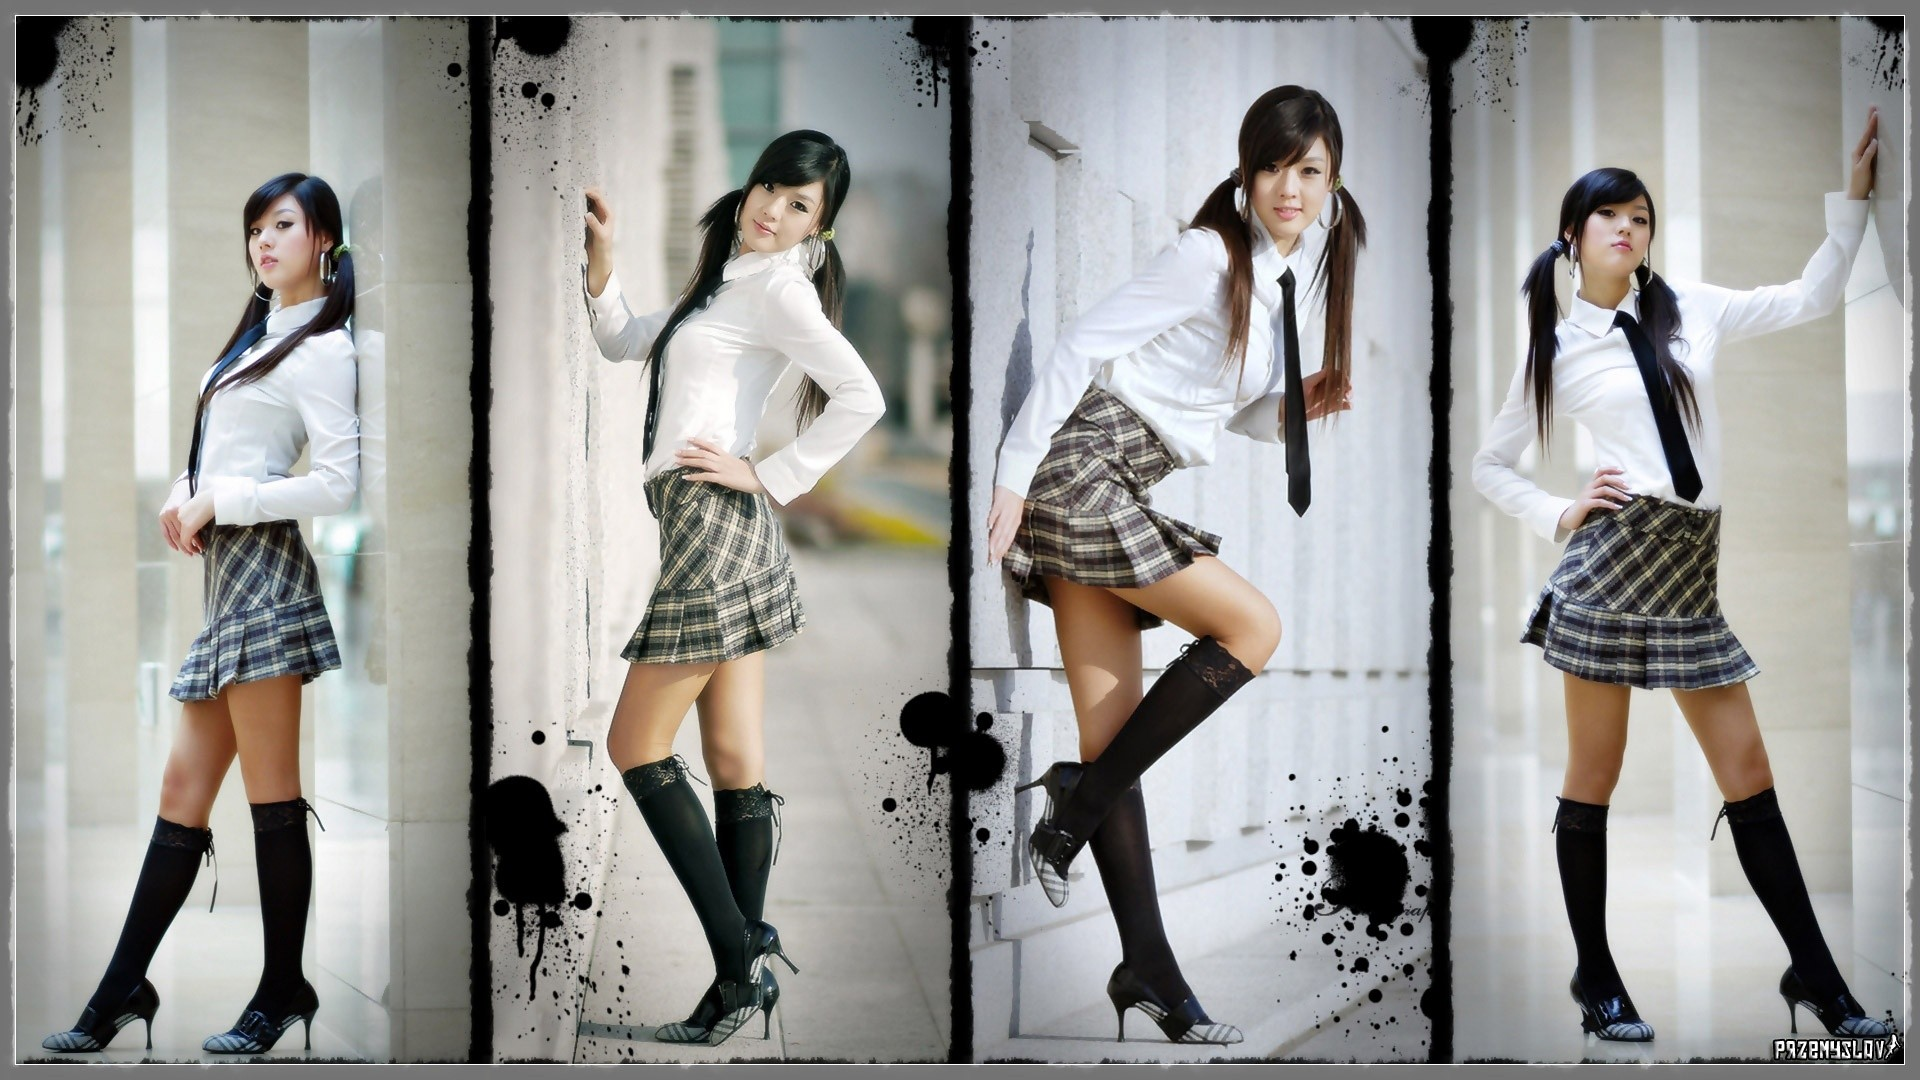 Hwang mi hee full hd wallpaper and background image 1920x1080 id celebrity hwang mi hee woman wallpaper voltagebd Images